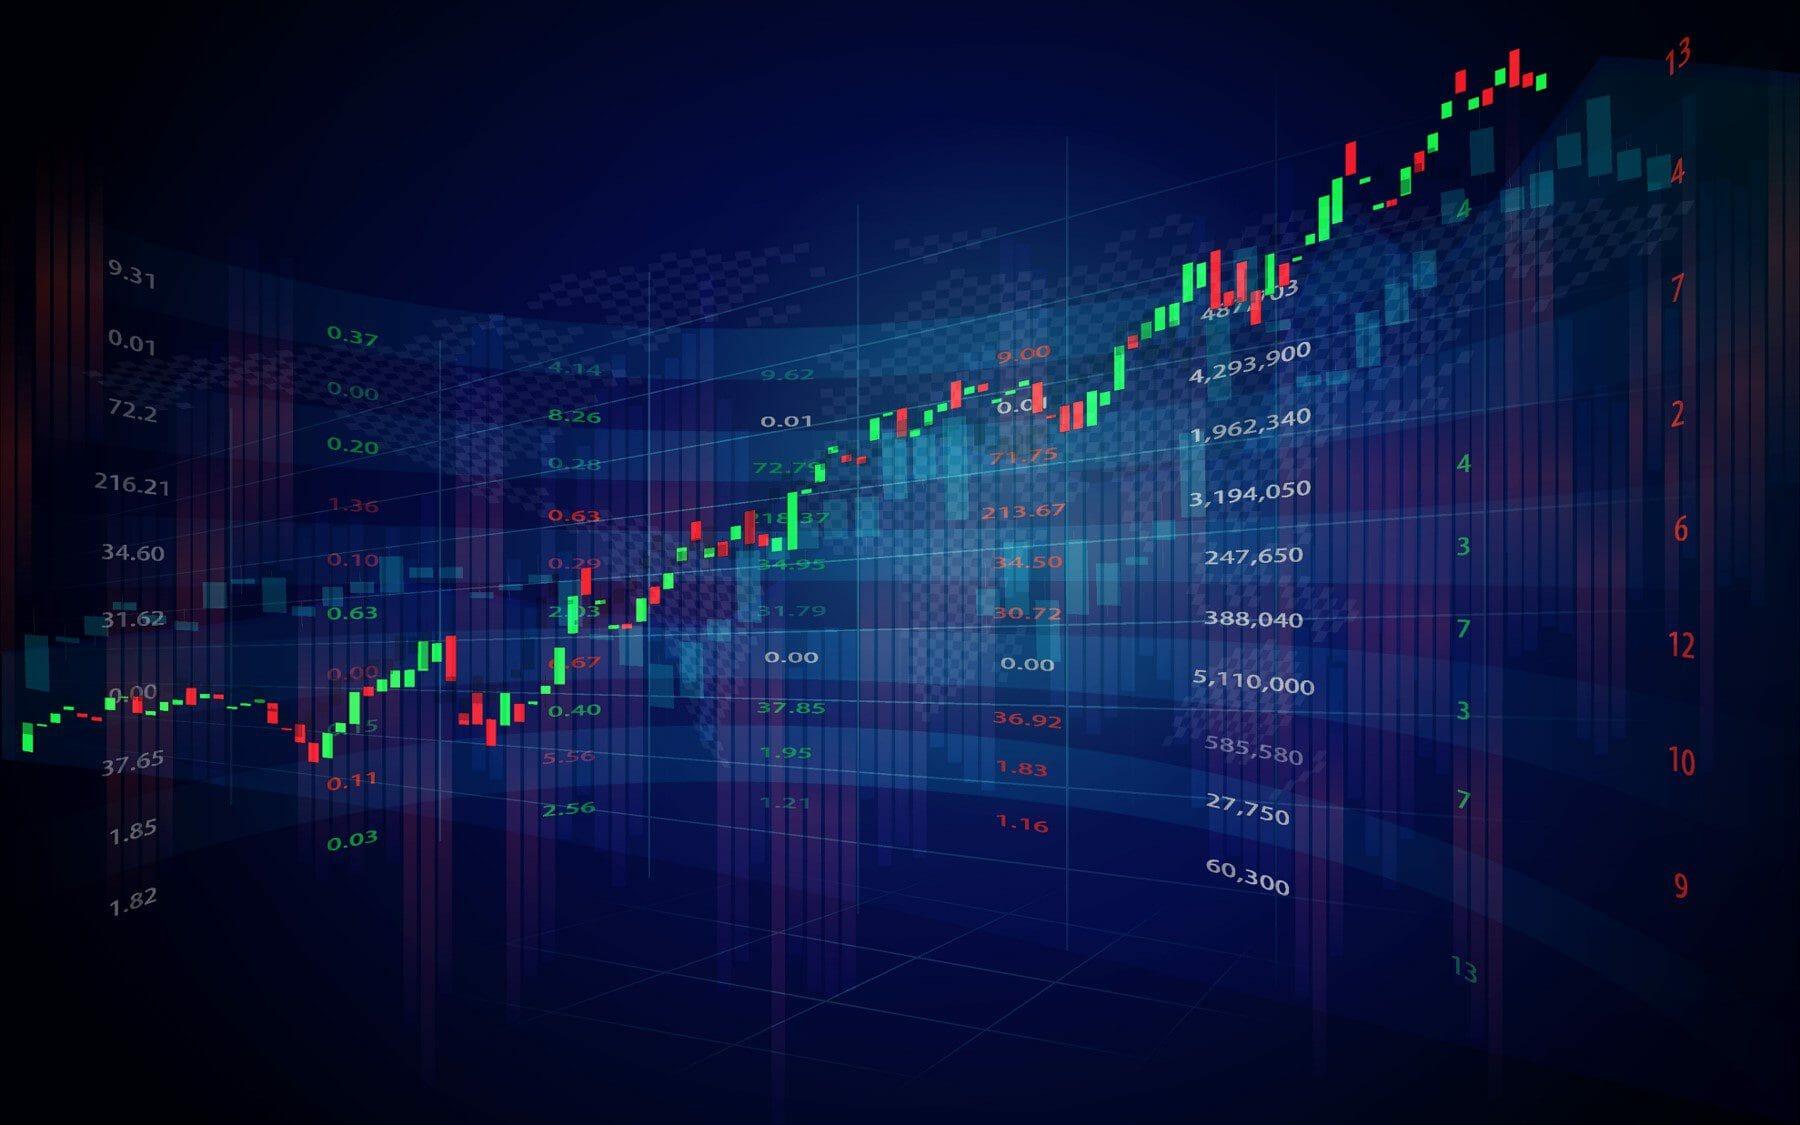 Stock Market Trend Trading